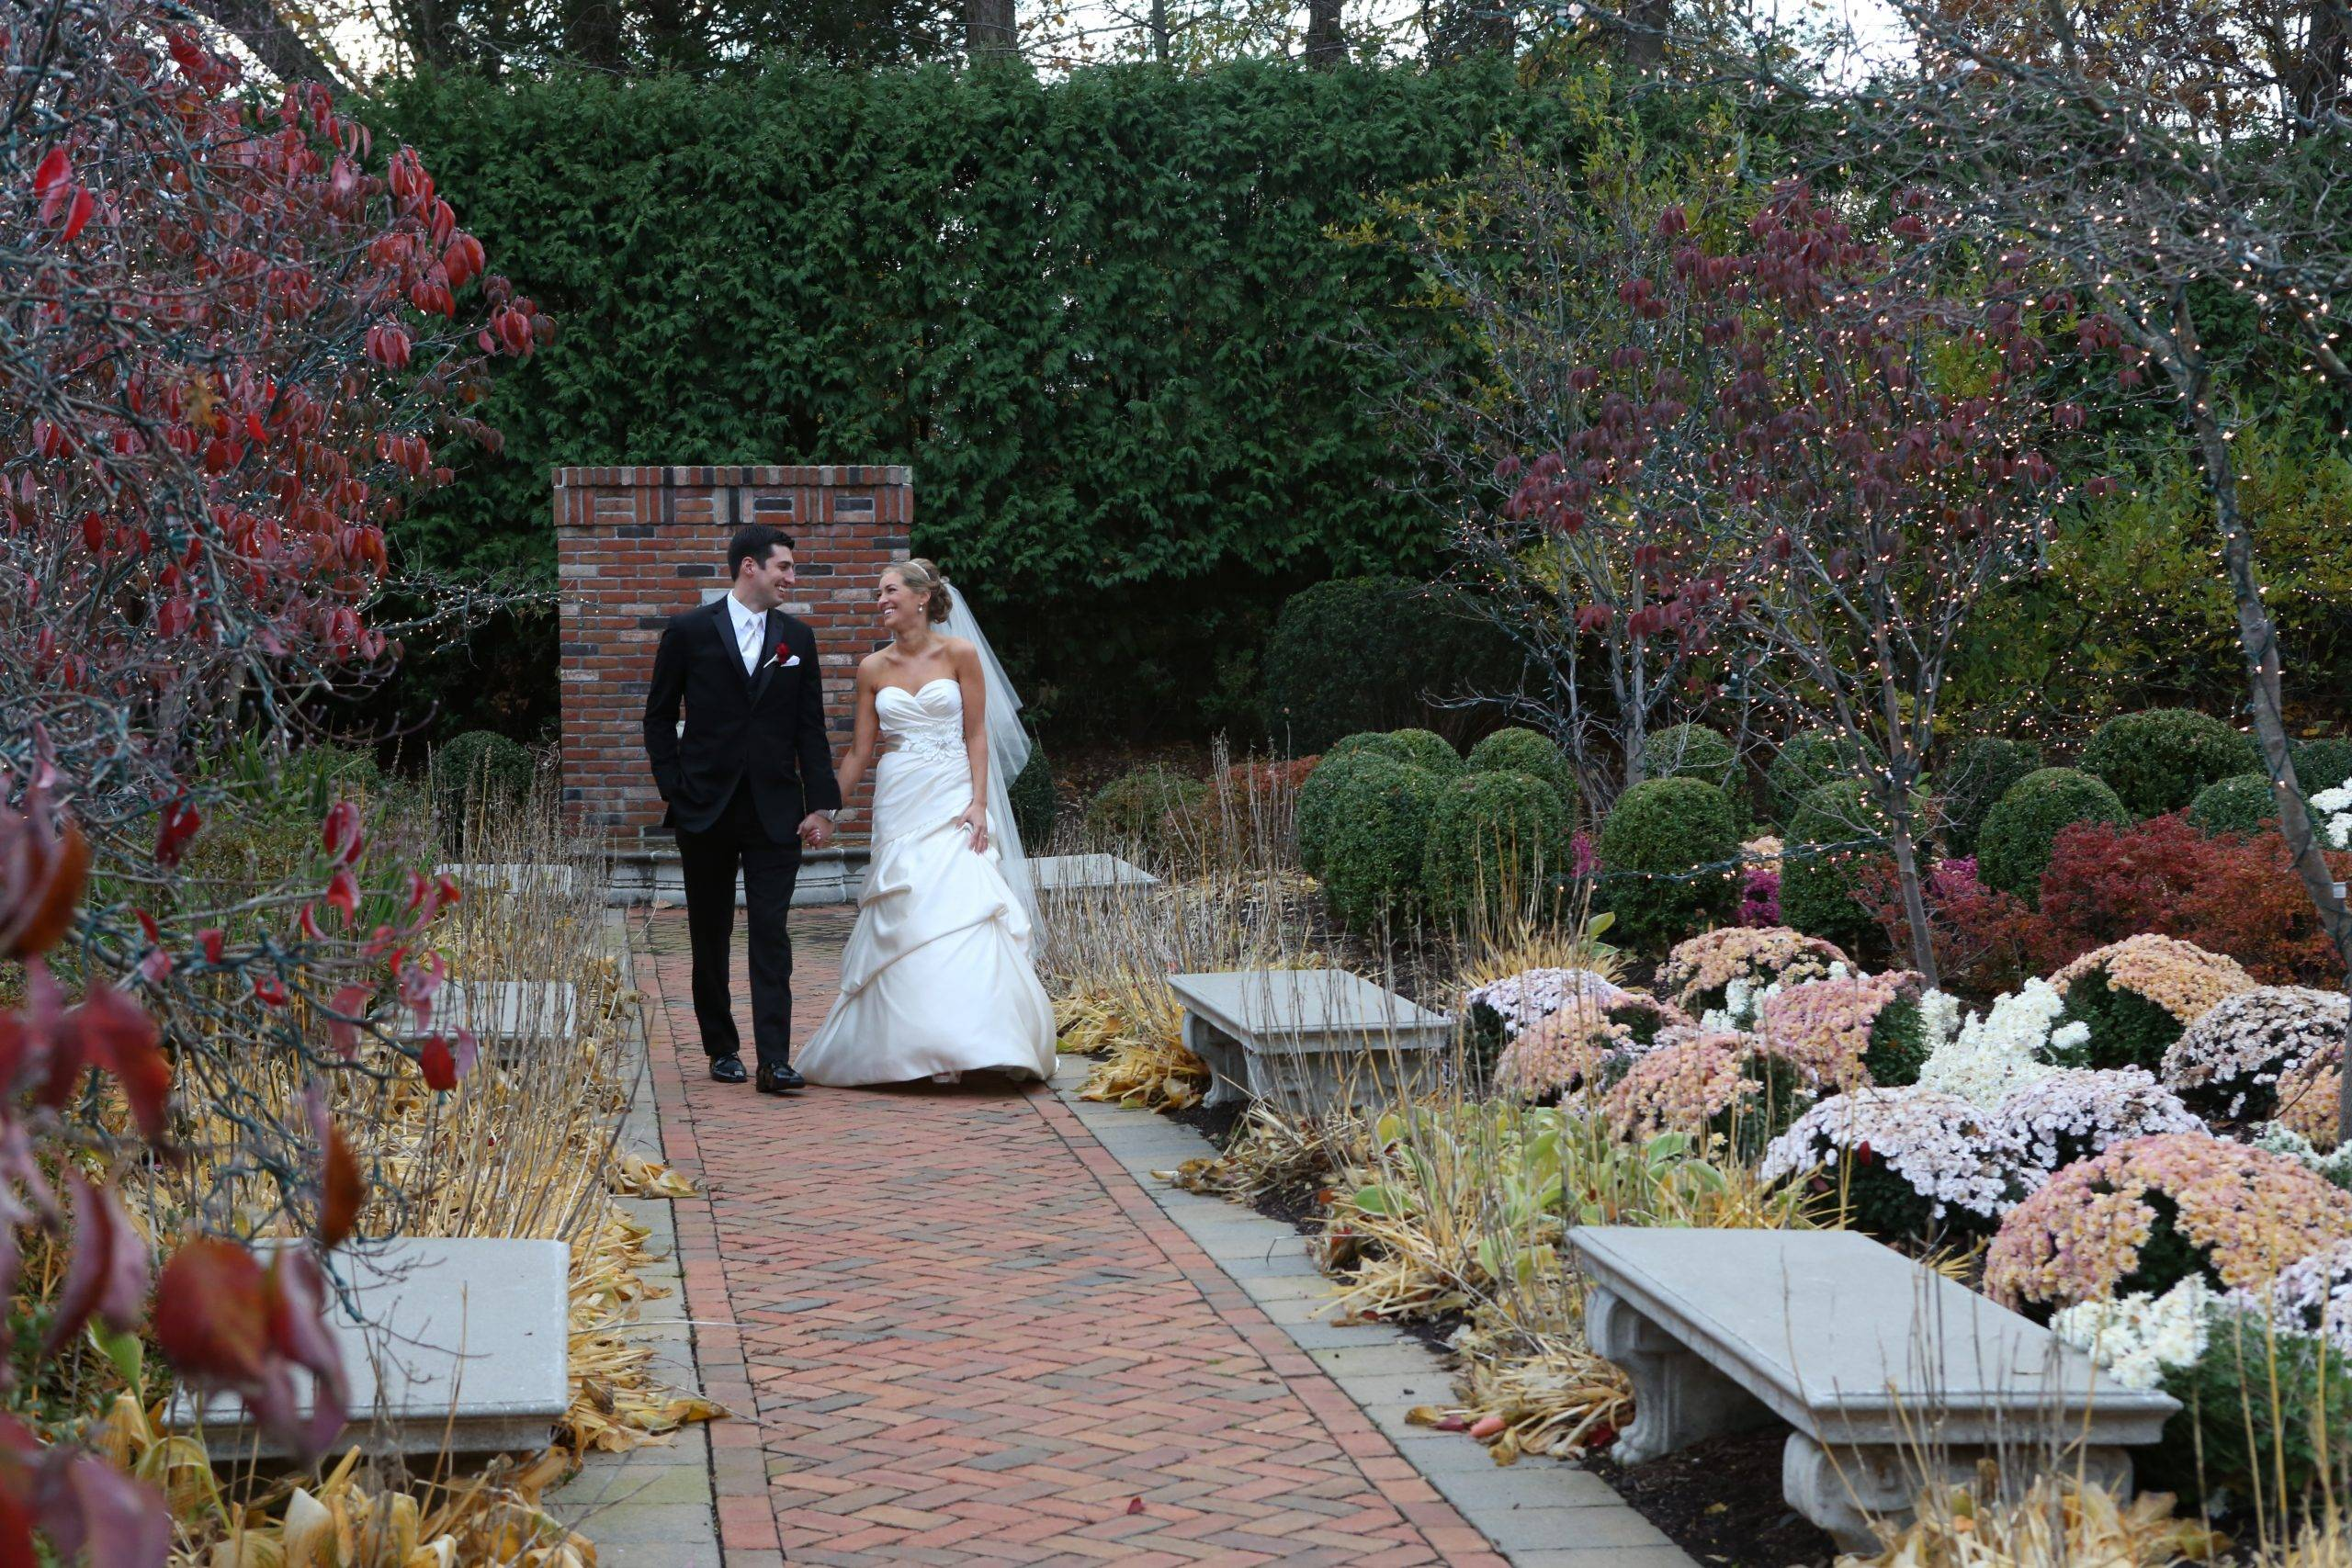 Florentine Gardens bride and groom in gardens